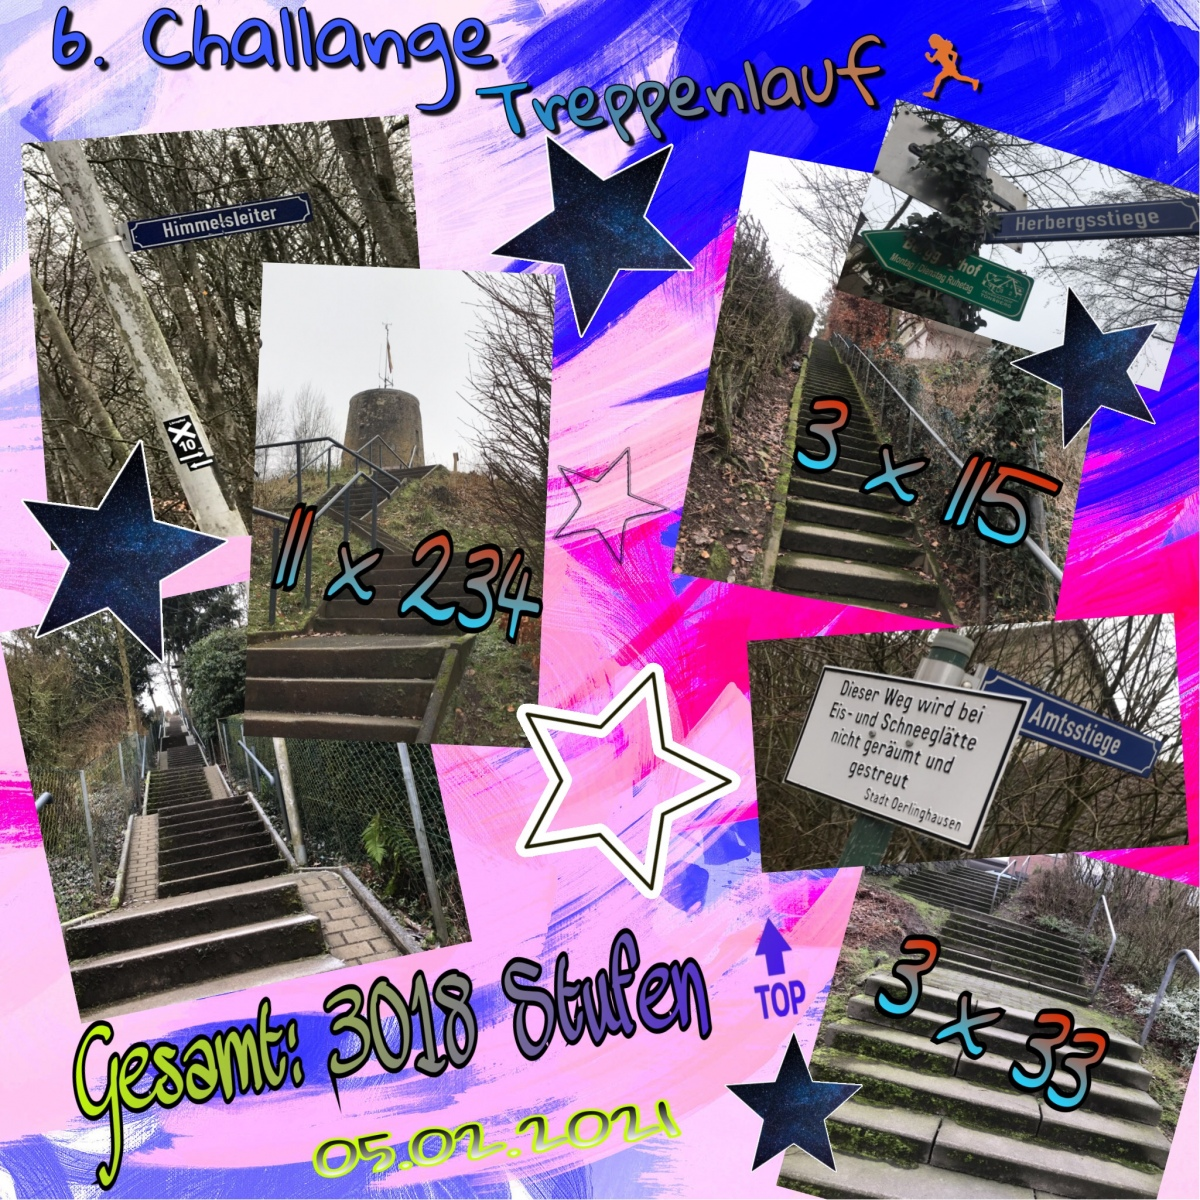 Wollny-Janssen-Yvonne-6-Challenge-Treppenlauf-RLh5c